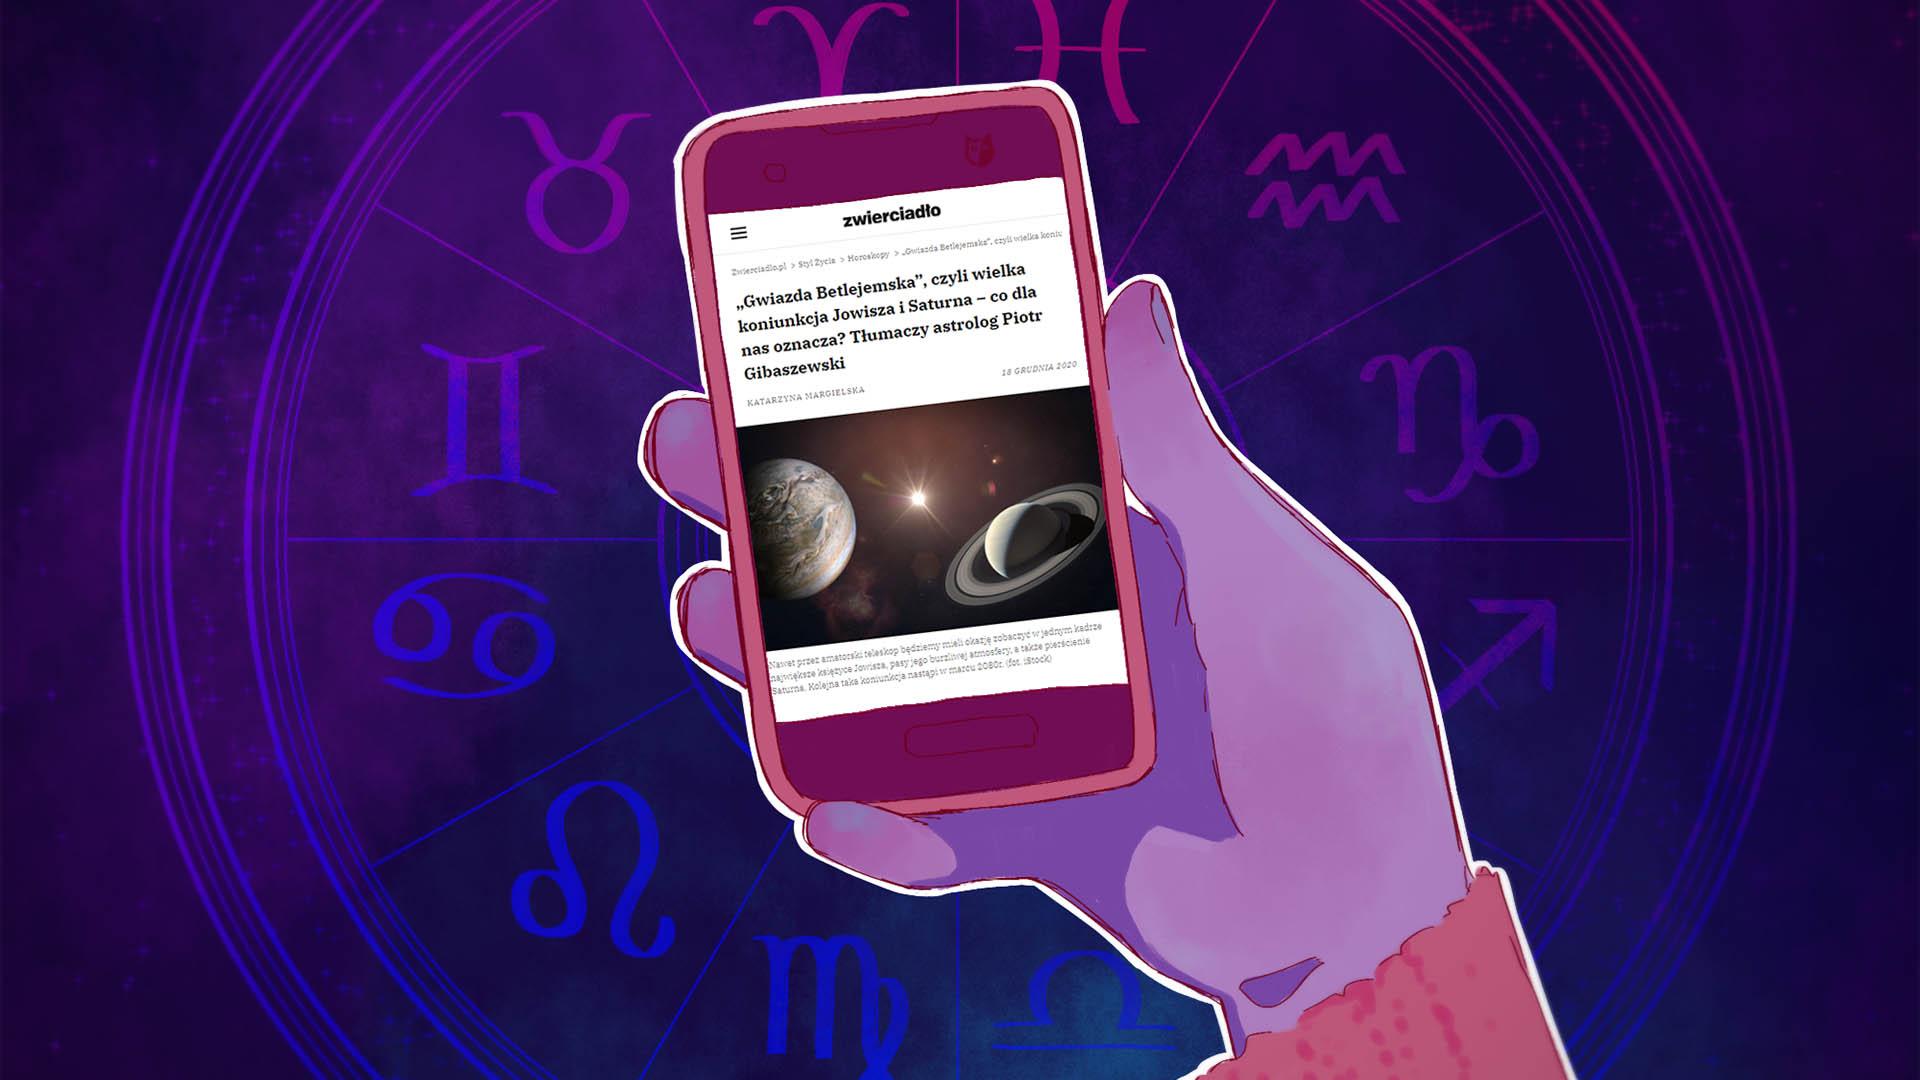 Astrologia to pseudonauka